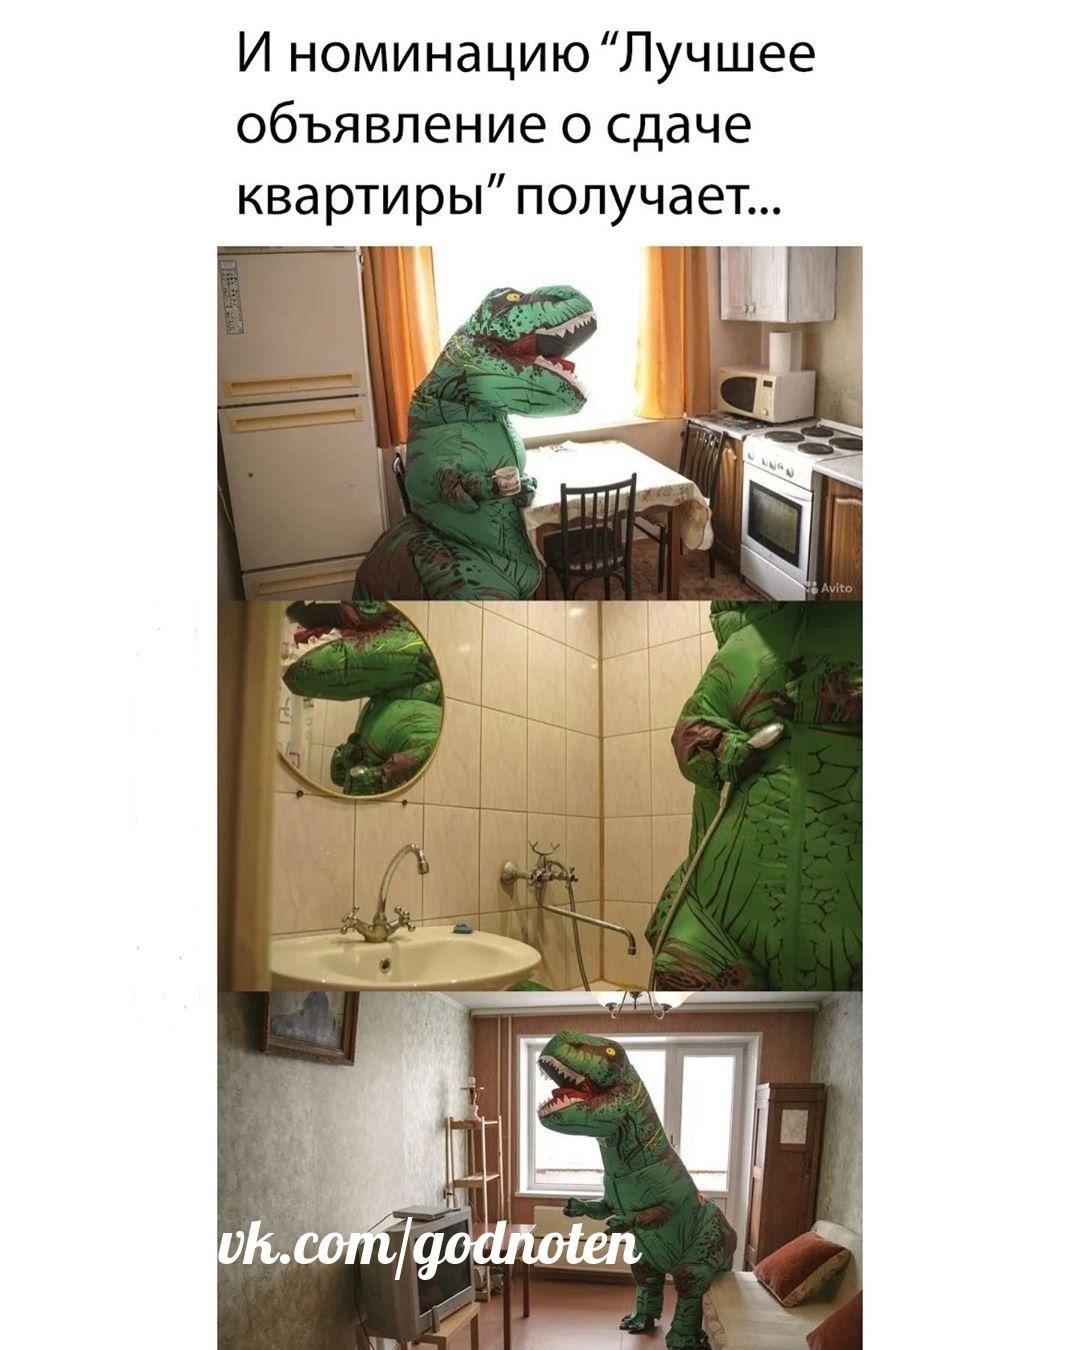 Костюм динозавра -